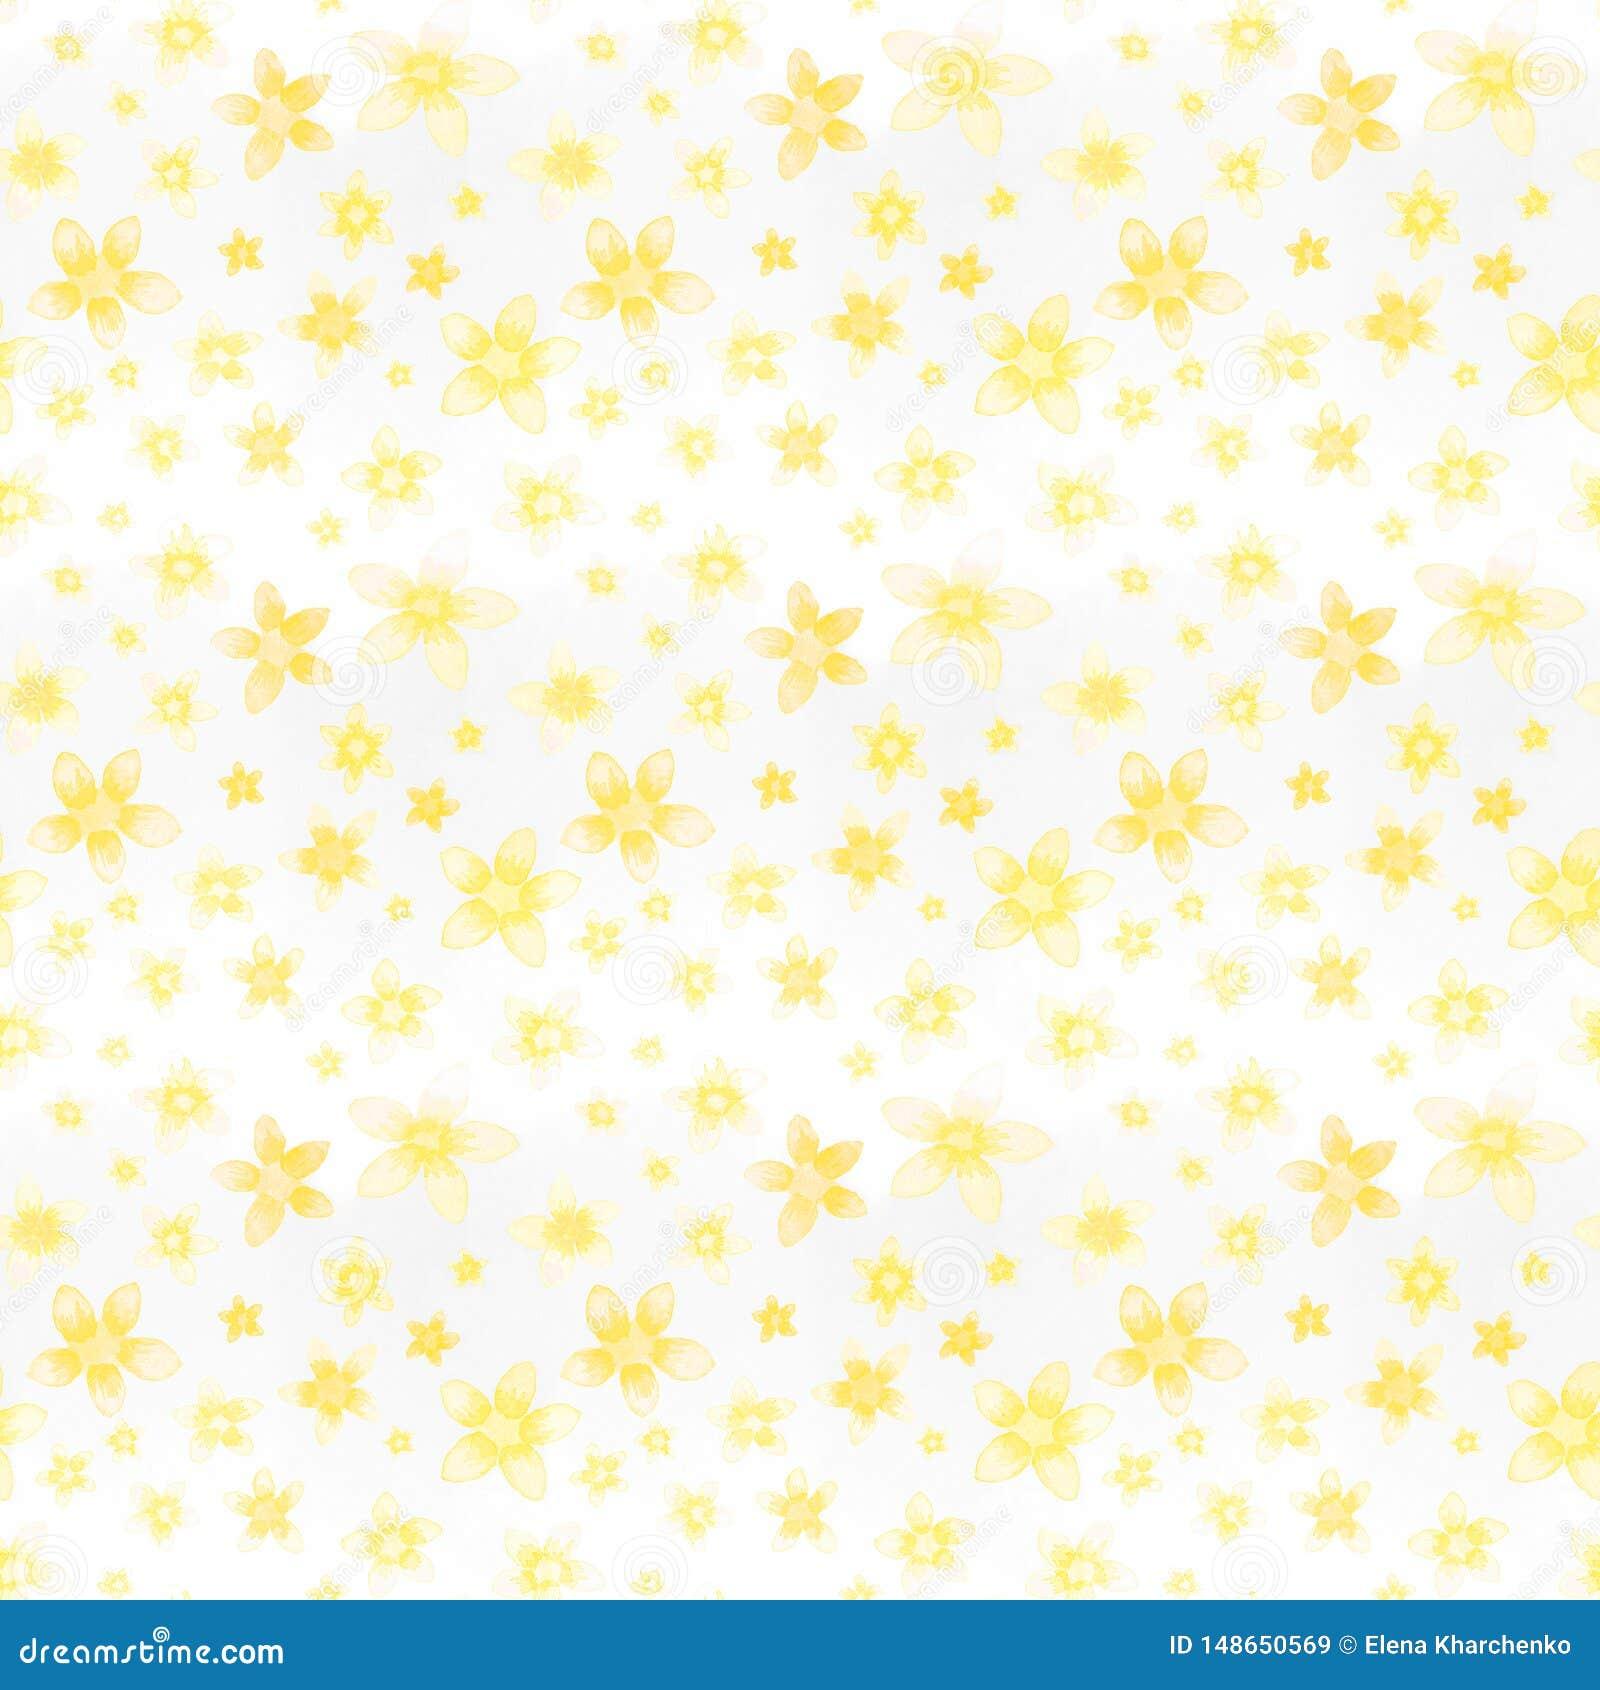 Den s?ml?sa modellvattenf?rgen m?lade gula sm? blommor